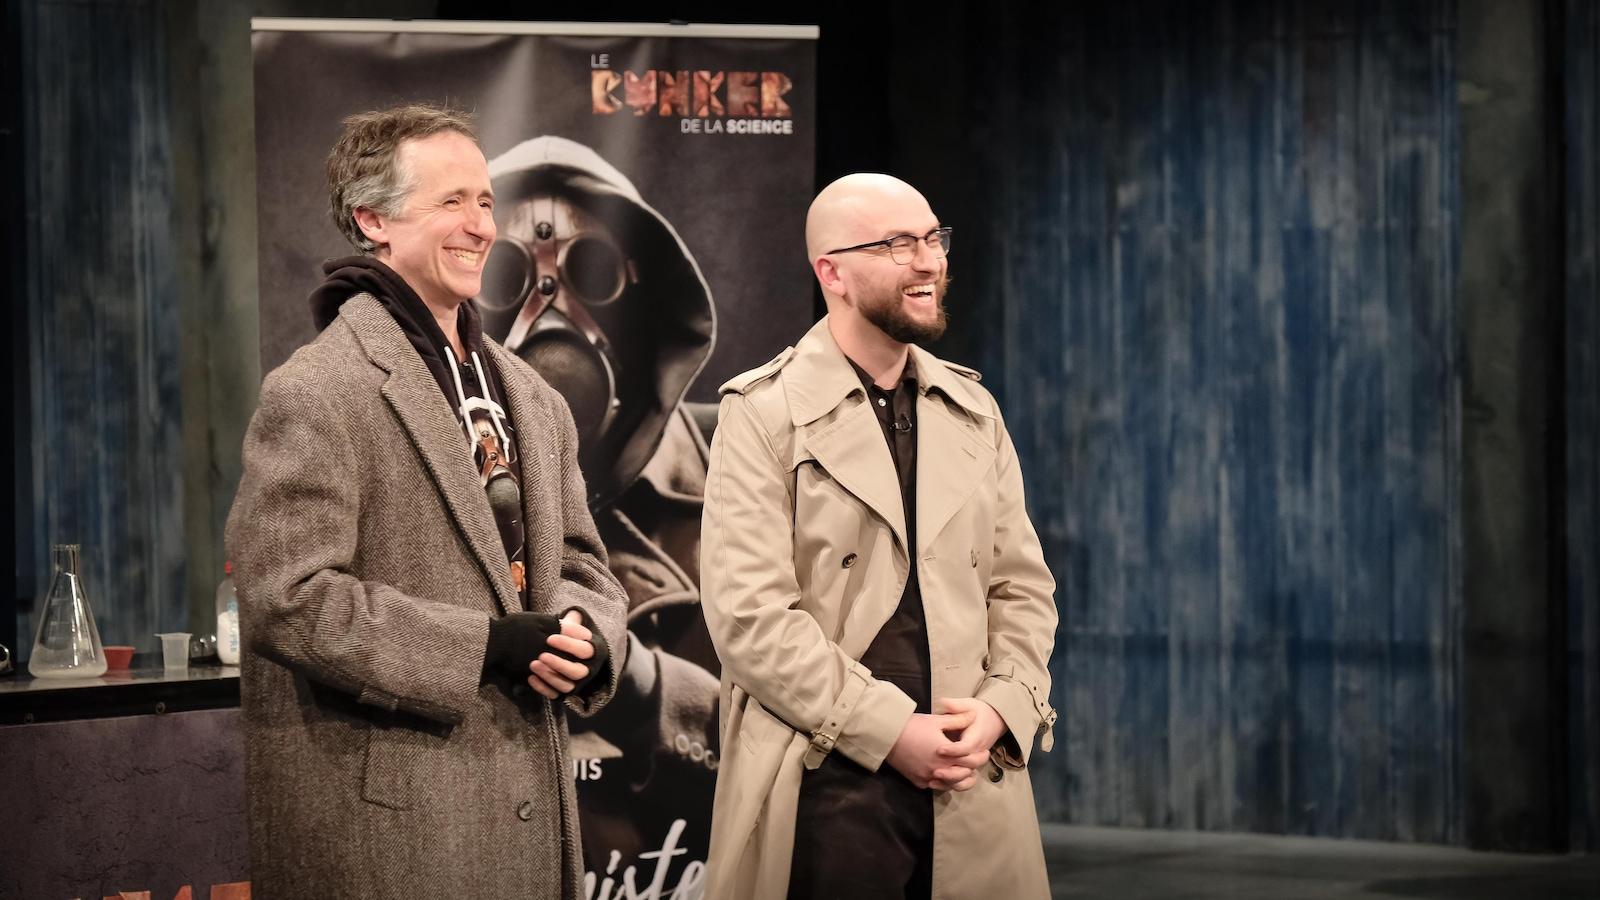 David Bertrand et Joël Leblanc du Bunker de la science.